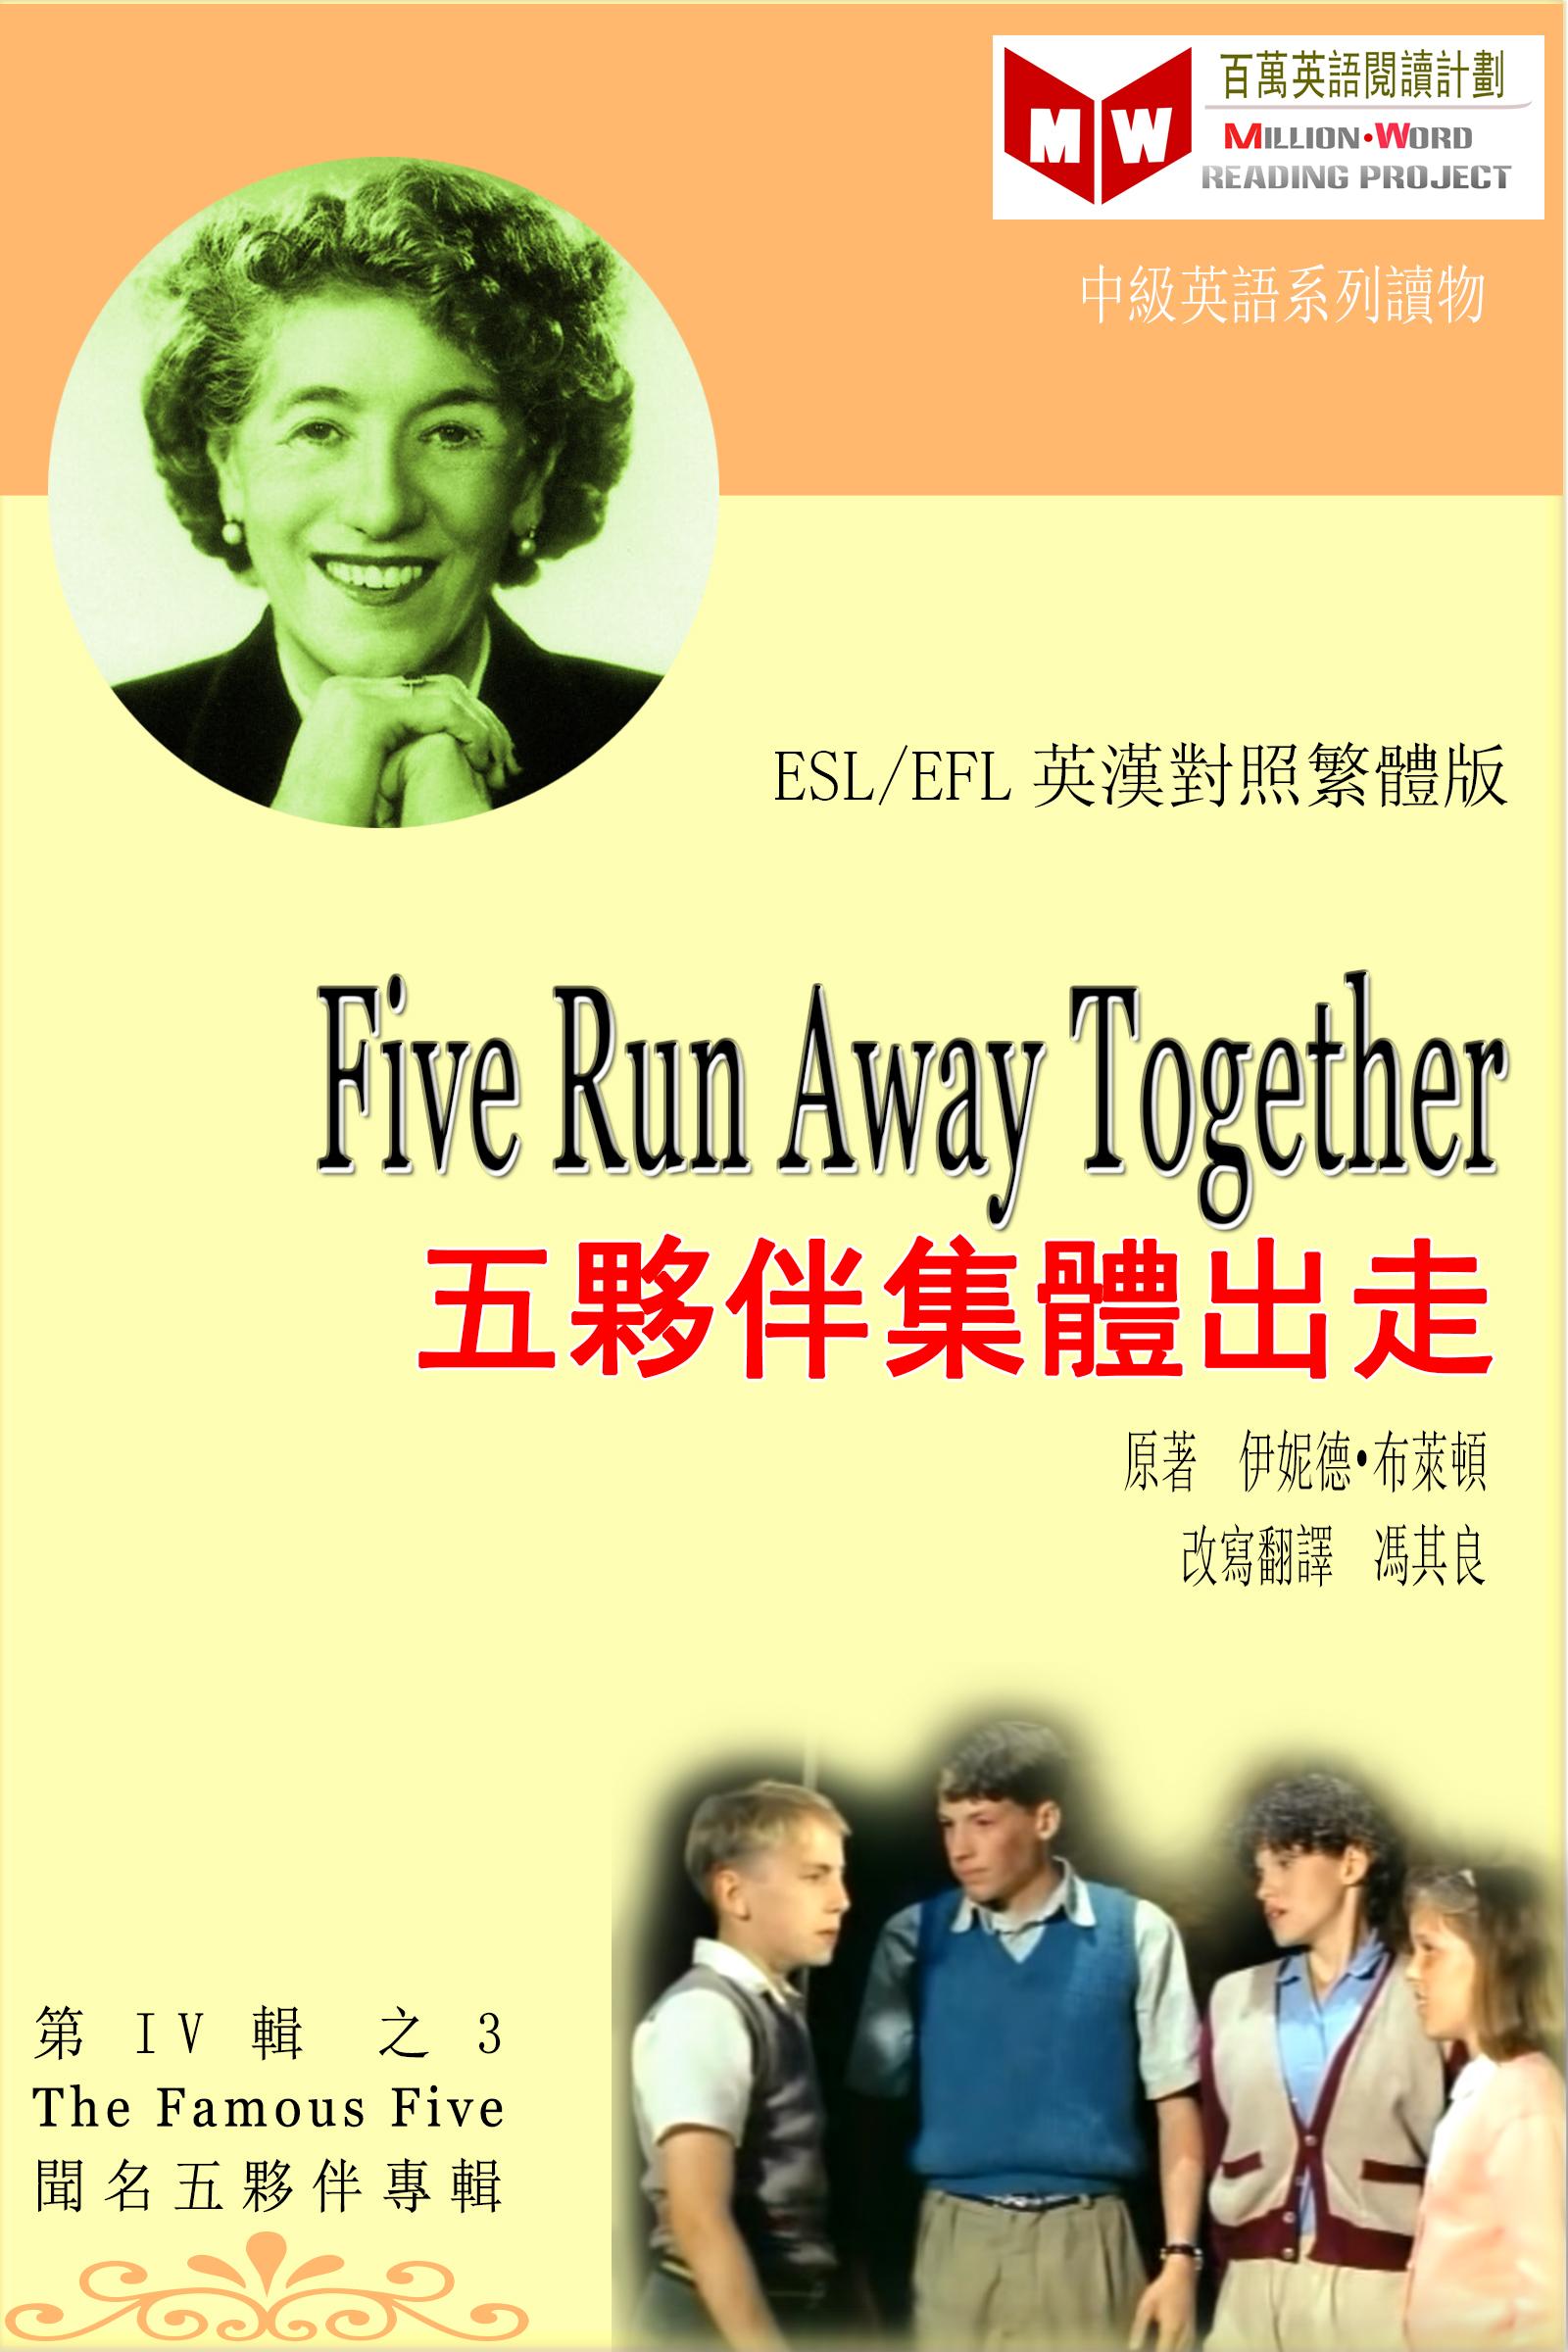 Smashwords – Five Run Away Together 五夥伴集體出走 (ESL/EFL 英漢對照繁體版) – a book by 馮 其良 & 伊妮德 •布萊頓